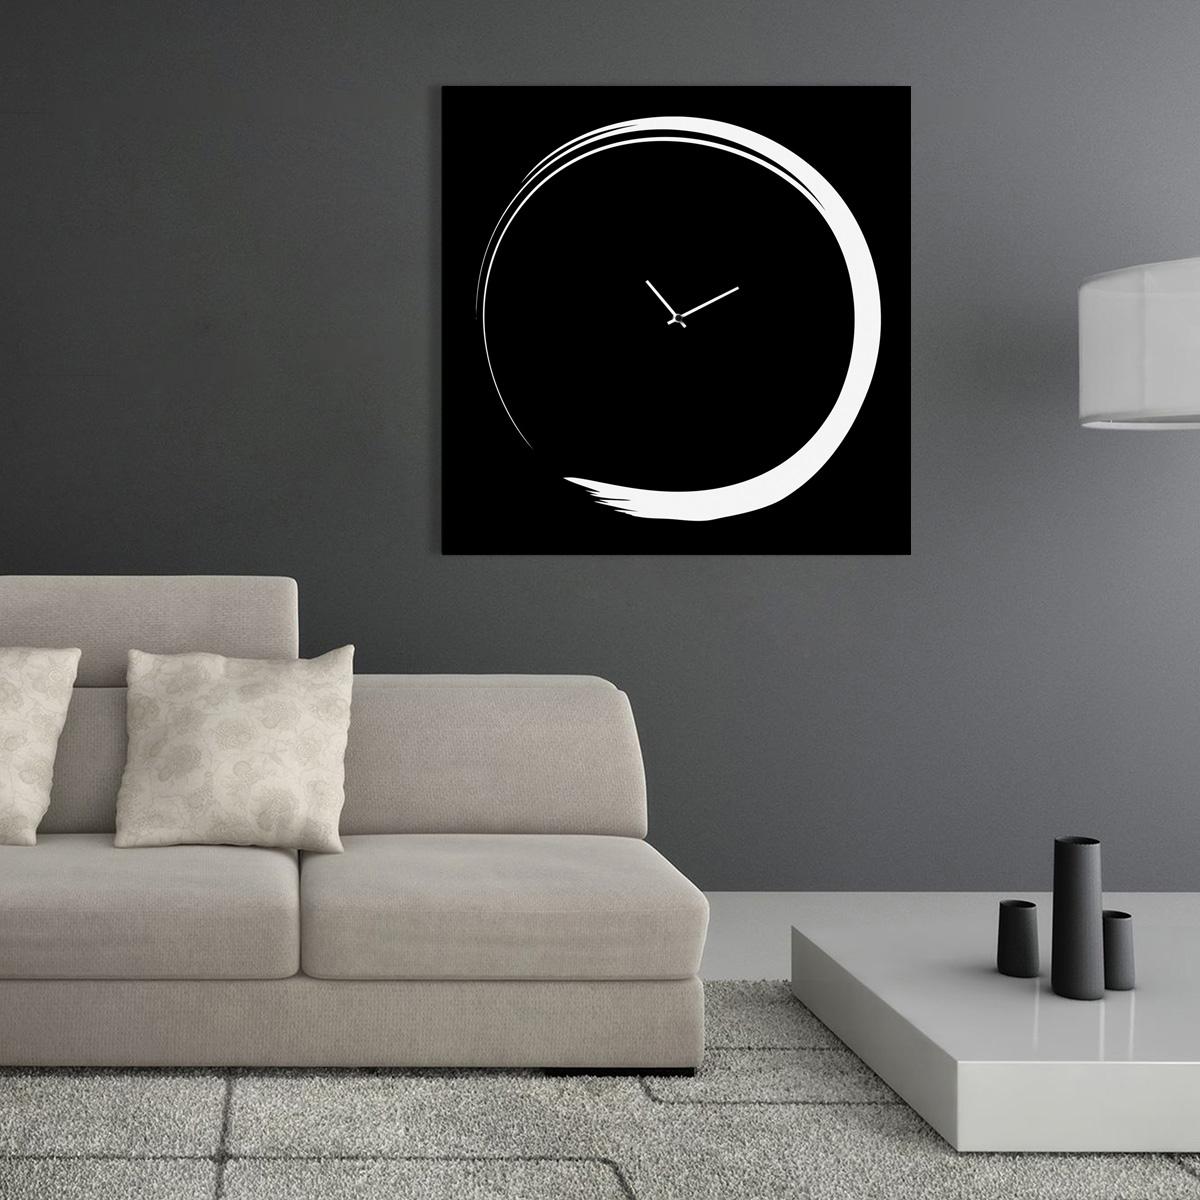 orologio-parete-grande-moderno-design-nero-elegante-wall-clock